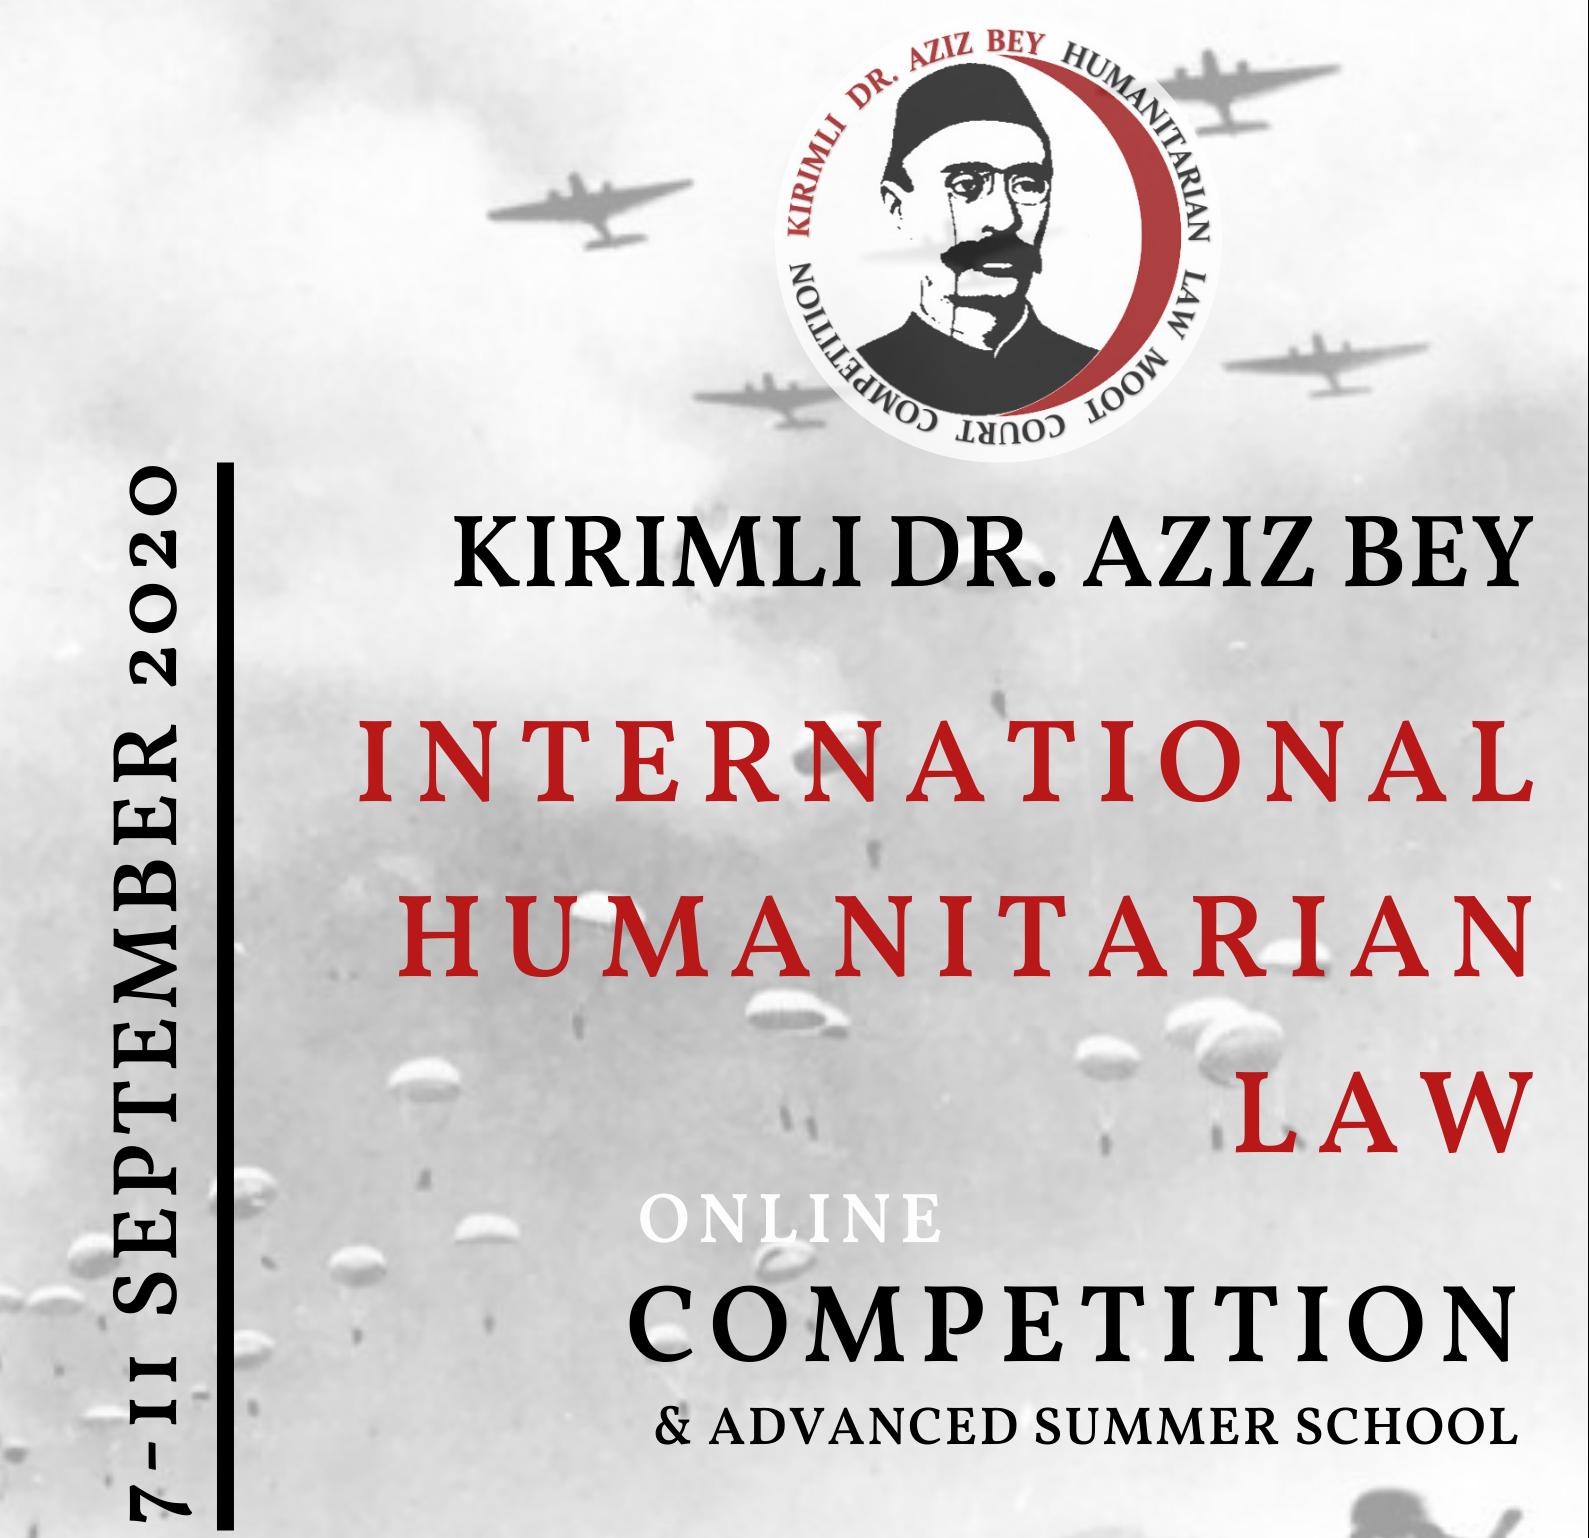 مدرسه تابستانه و مسابقات موتکورت حقوق بینالملل بشردوستانه (دکتر عزیز بِی)